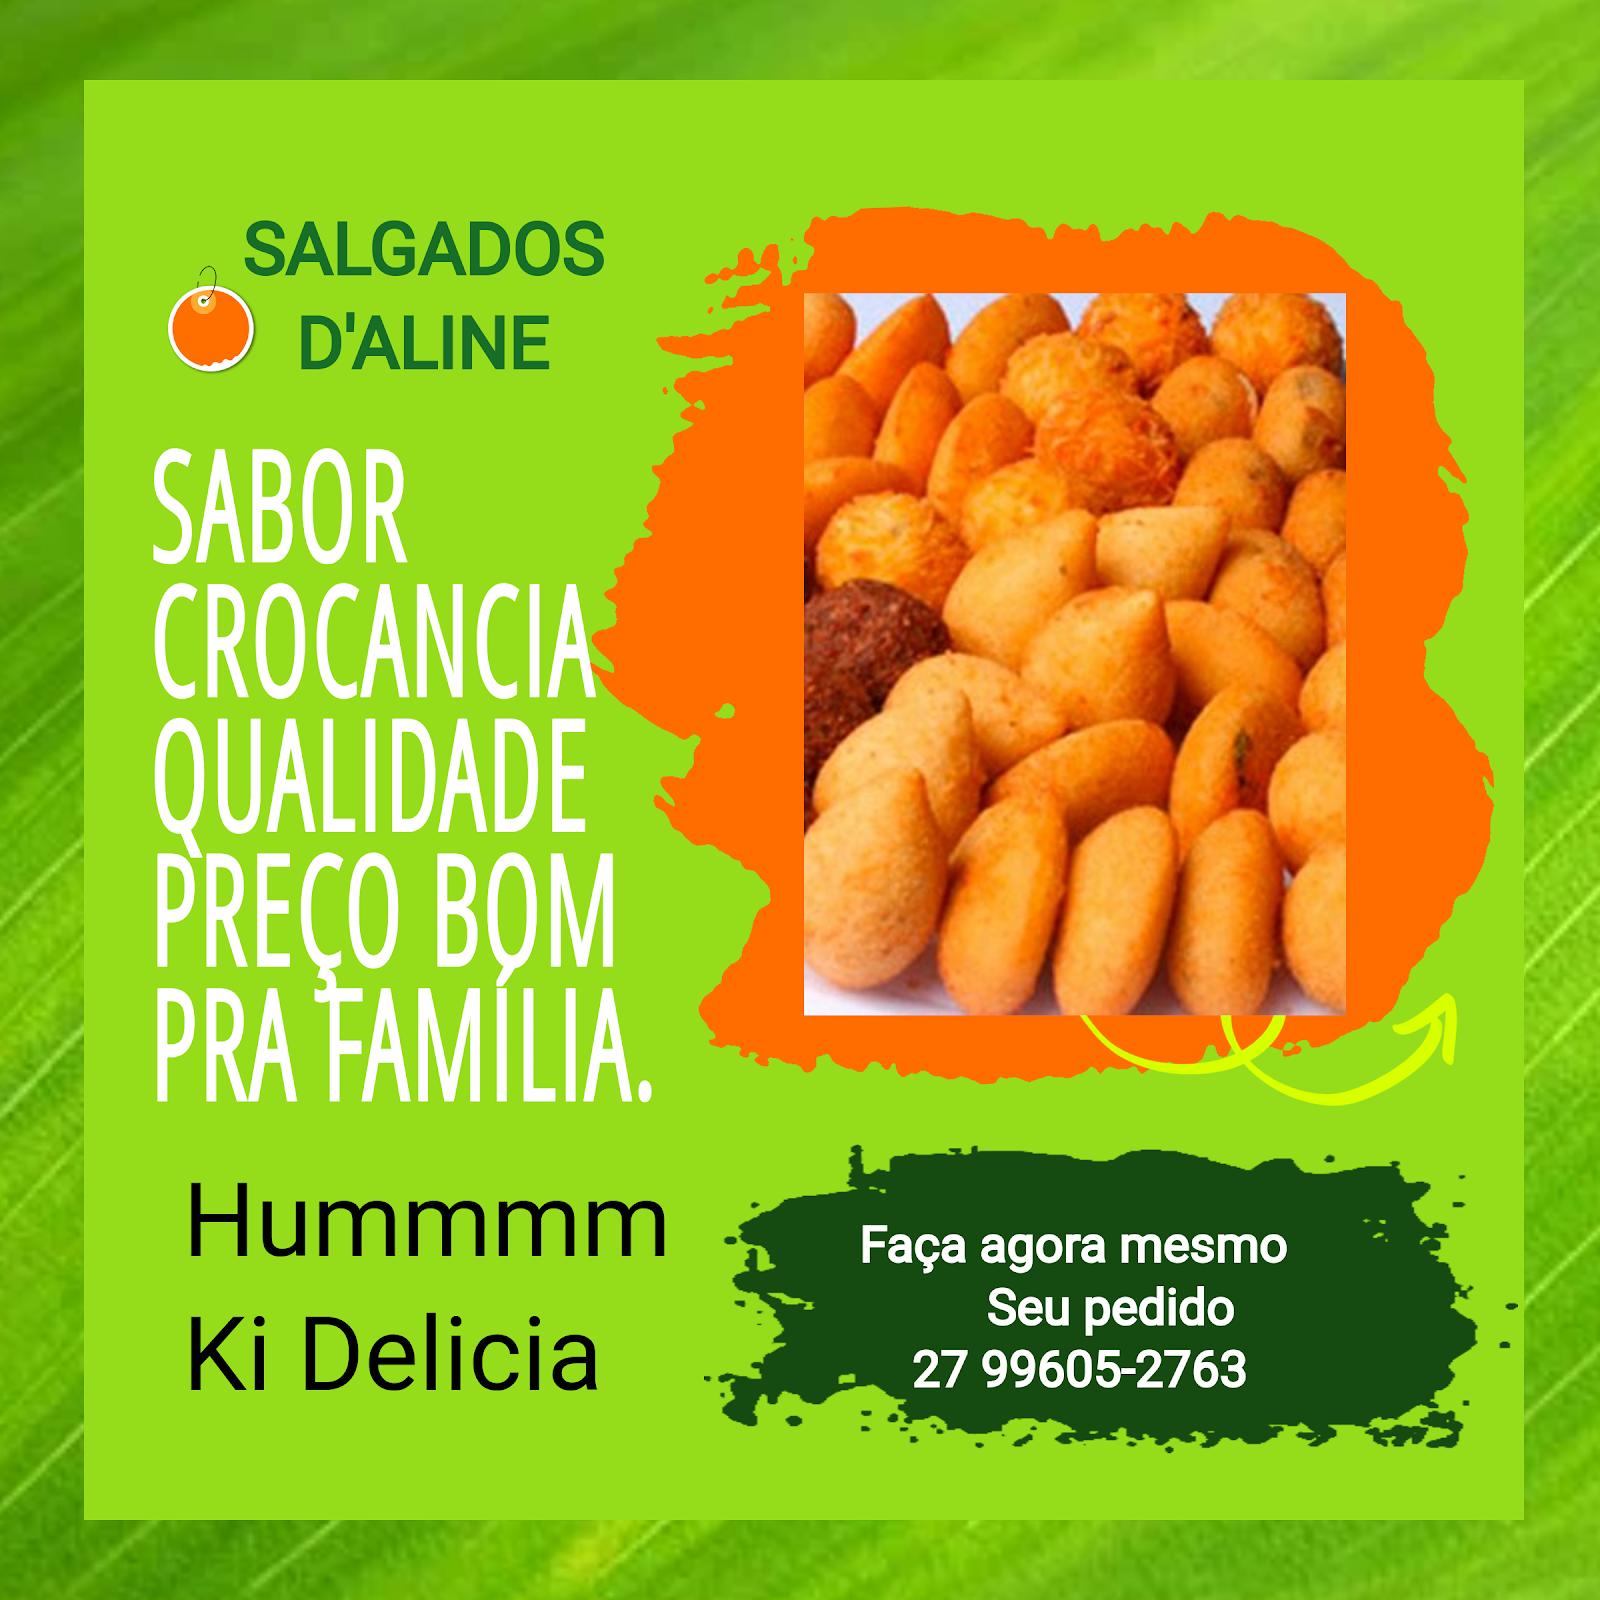 SALGADOS D' ALINE